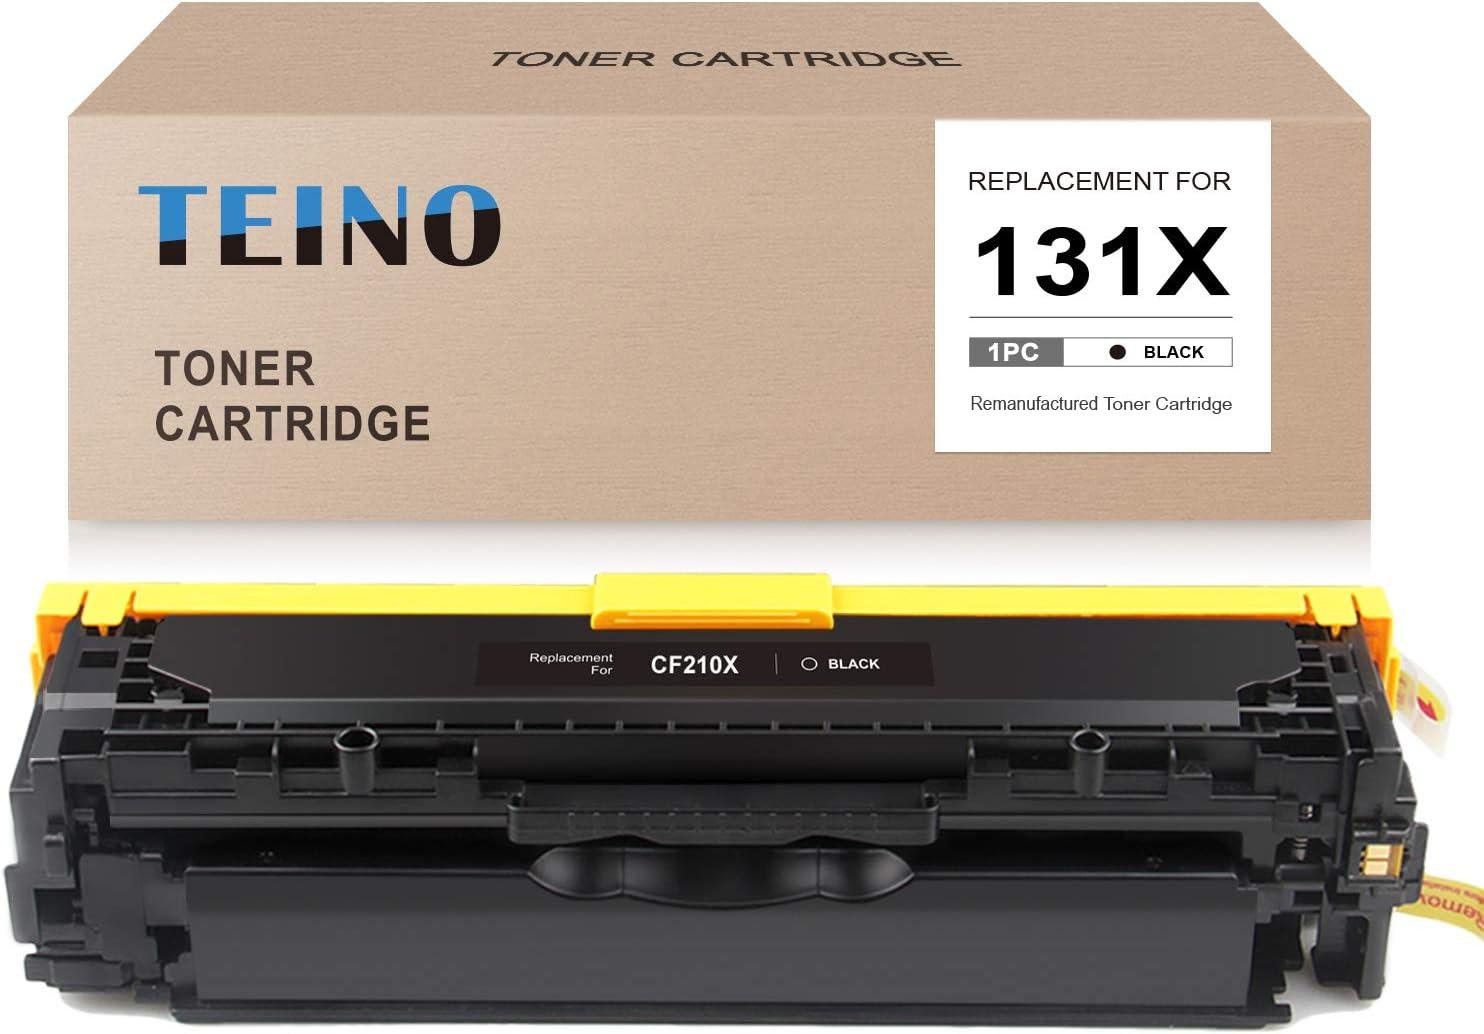 TEINO Remanufactured Toner Cartridge Replacement for HP 131X CF210X 131A CF210A use with HP Laserjet Pro 200 Color MFP M276nw MFP M276n M251nw M251n (Black, 1-Pack)